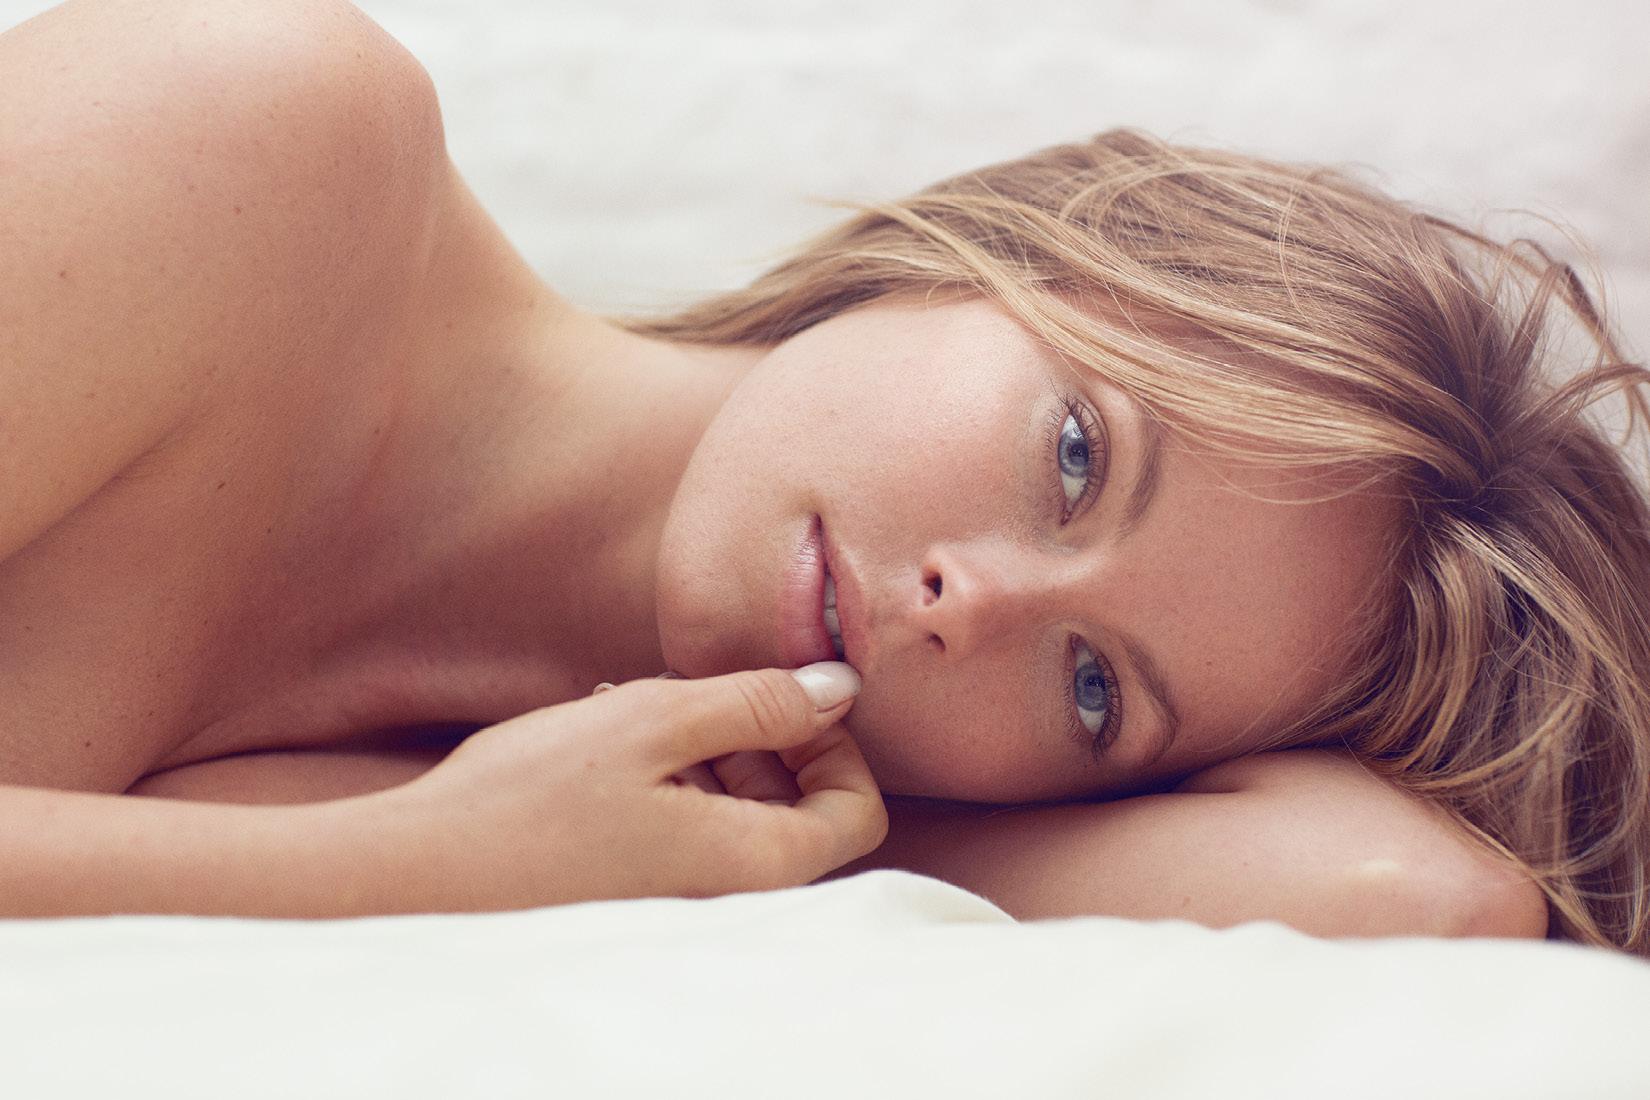 Beauty_Horiziontal_Singles11.jpg